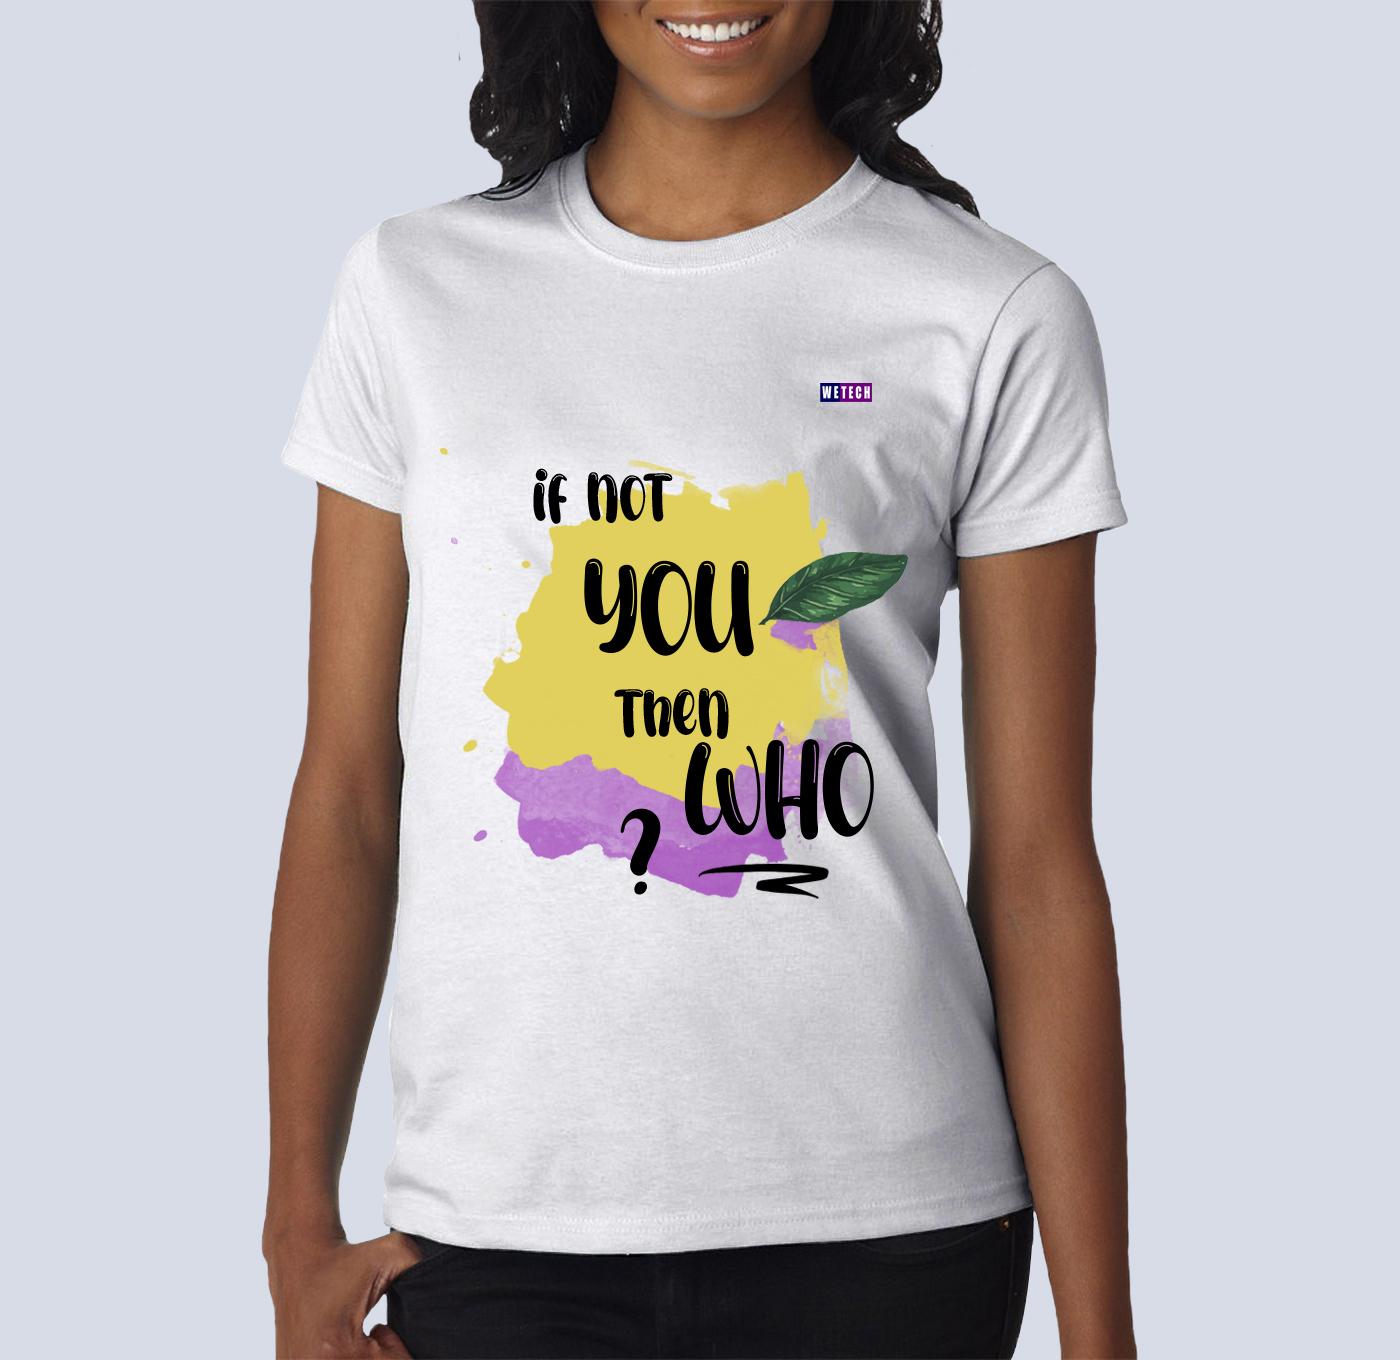 t-shirt - If not you 1